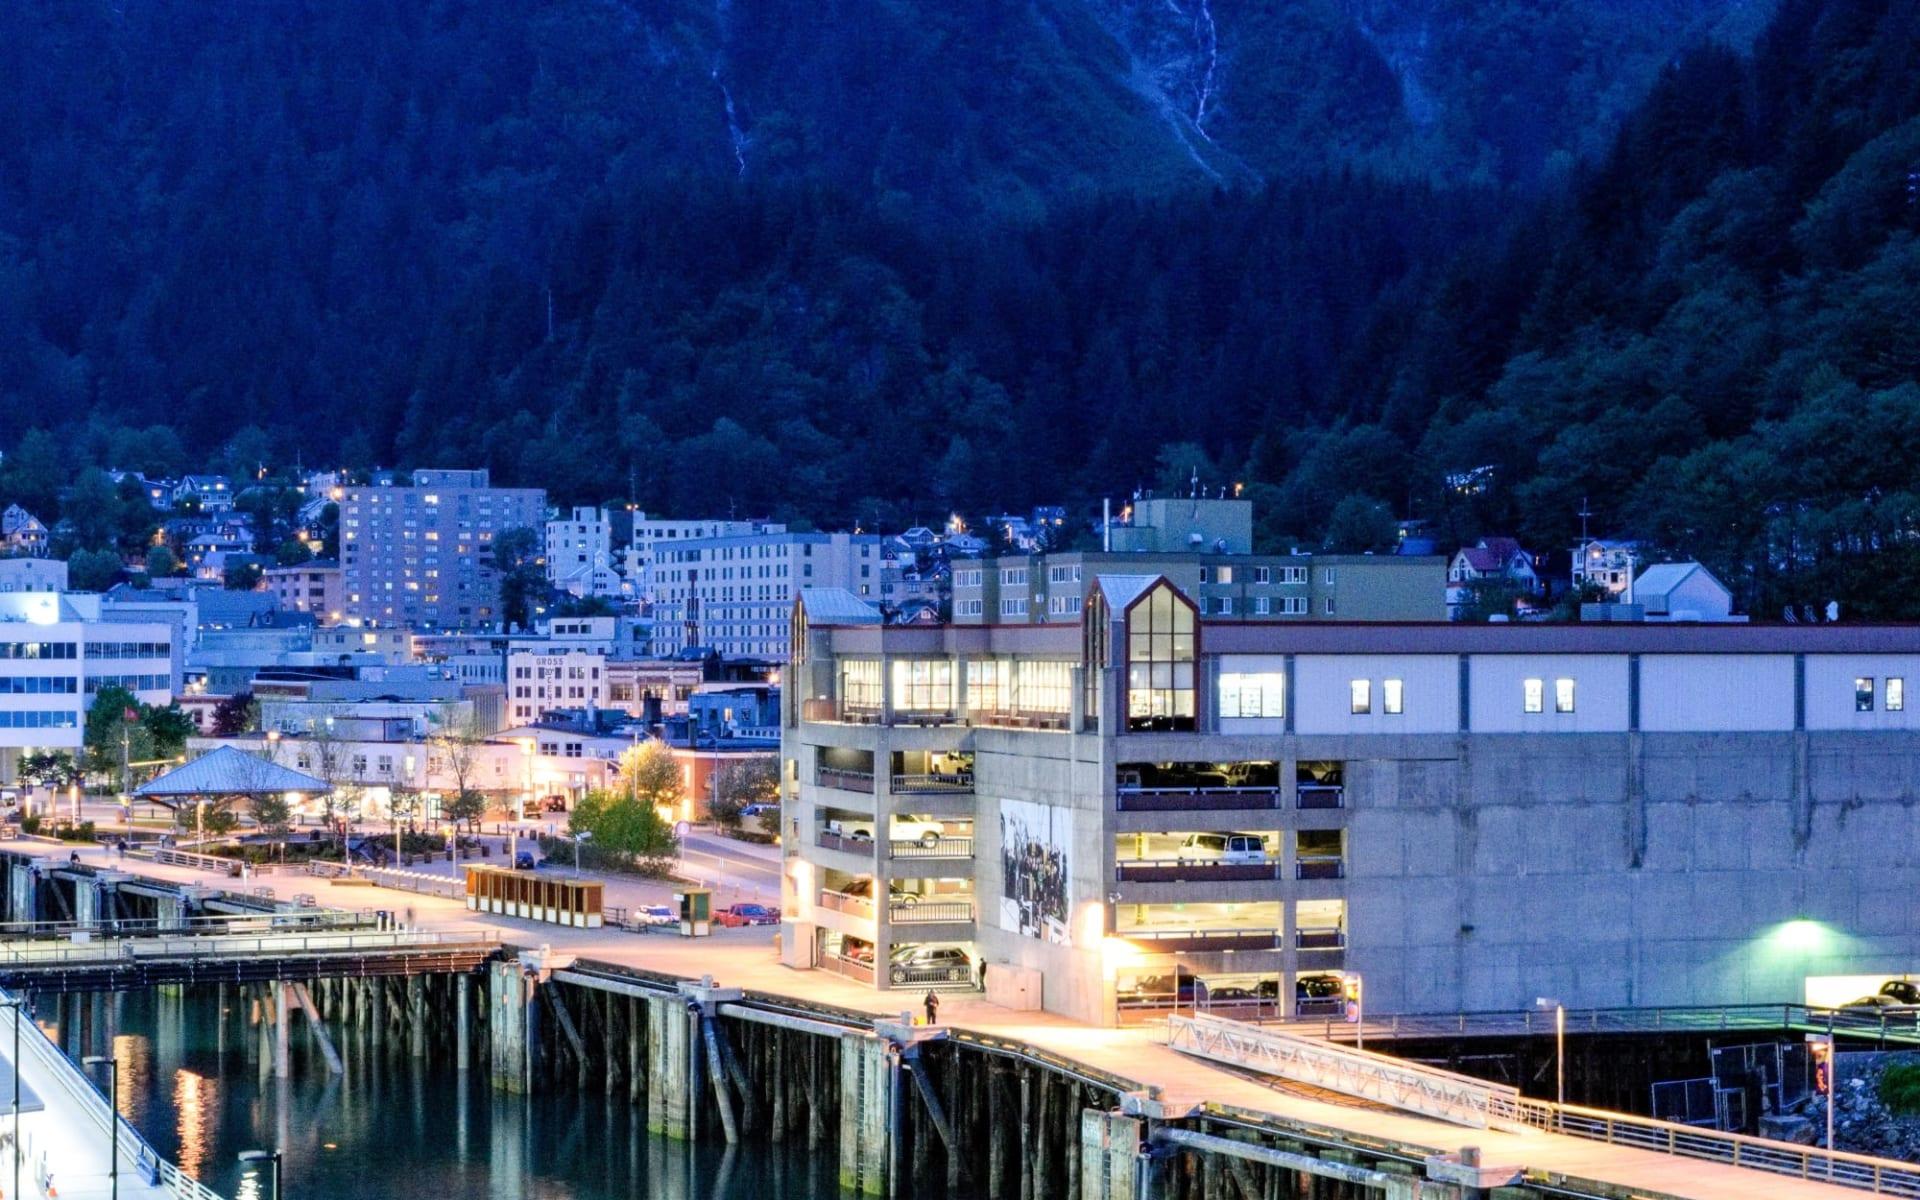 Baranof Hotel, BW Signature Collection in Juneau: shutterstock_1067544299_juneau